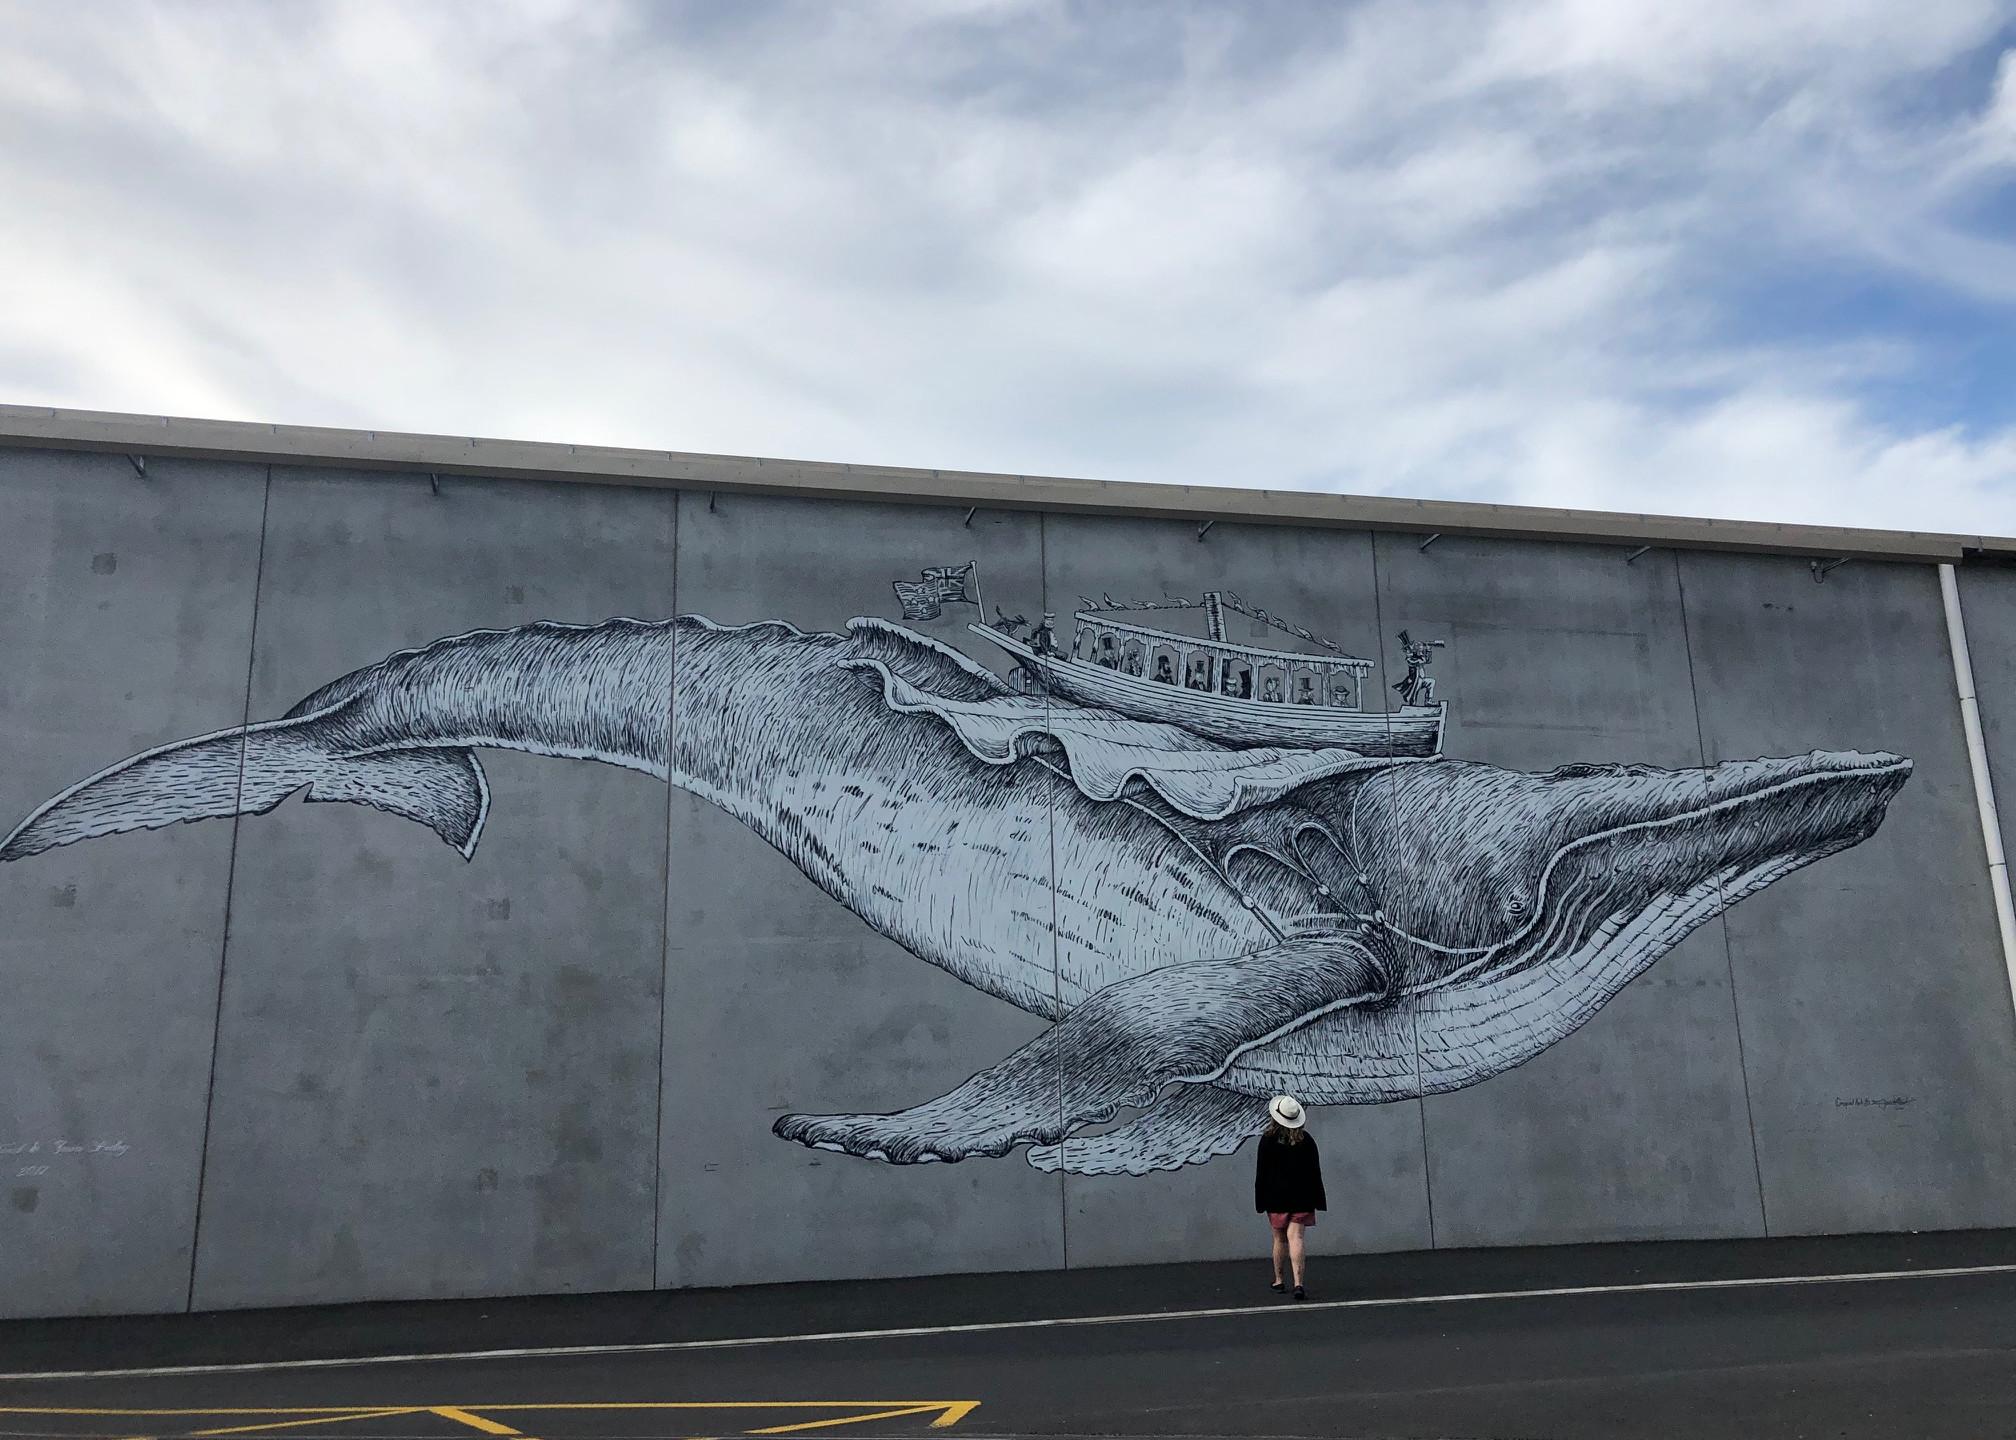 Port Chalmers, dunedin, puerto,